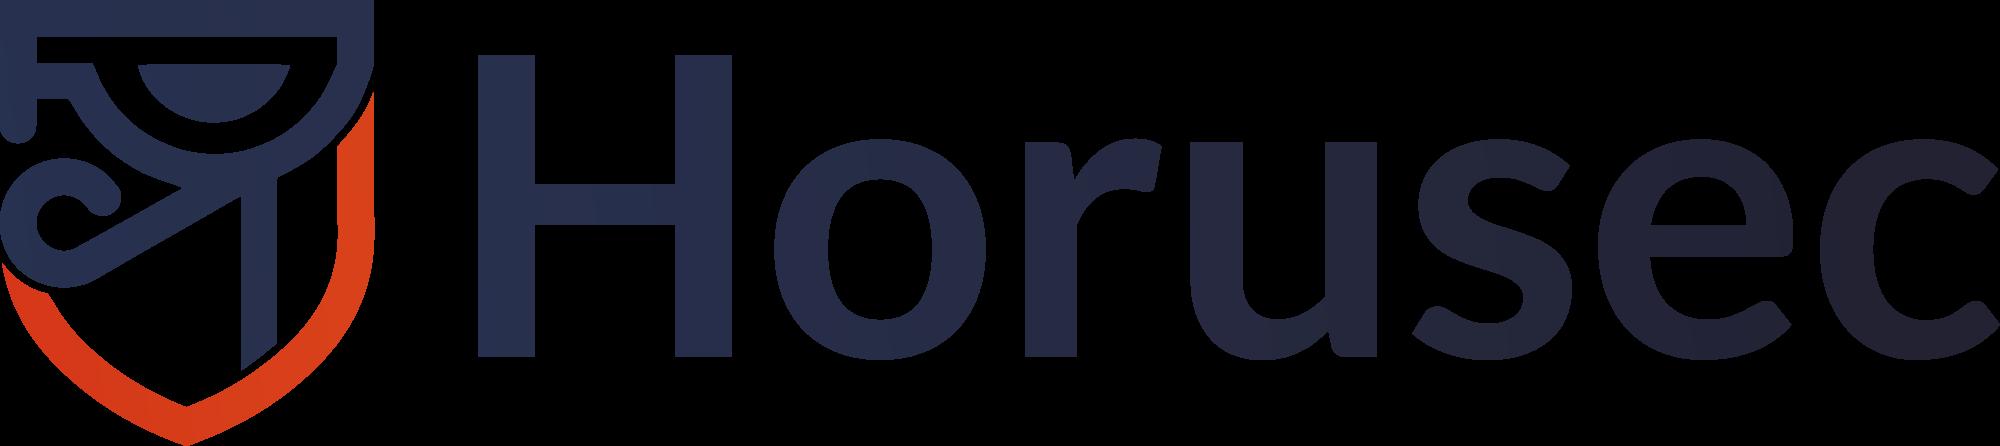 horusec logo - horusec: Βρείτε τρωτά σημεία στα project σας